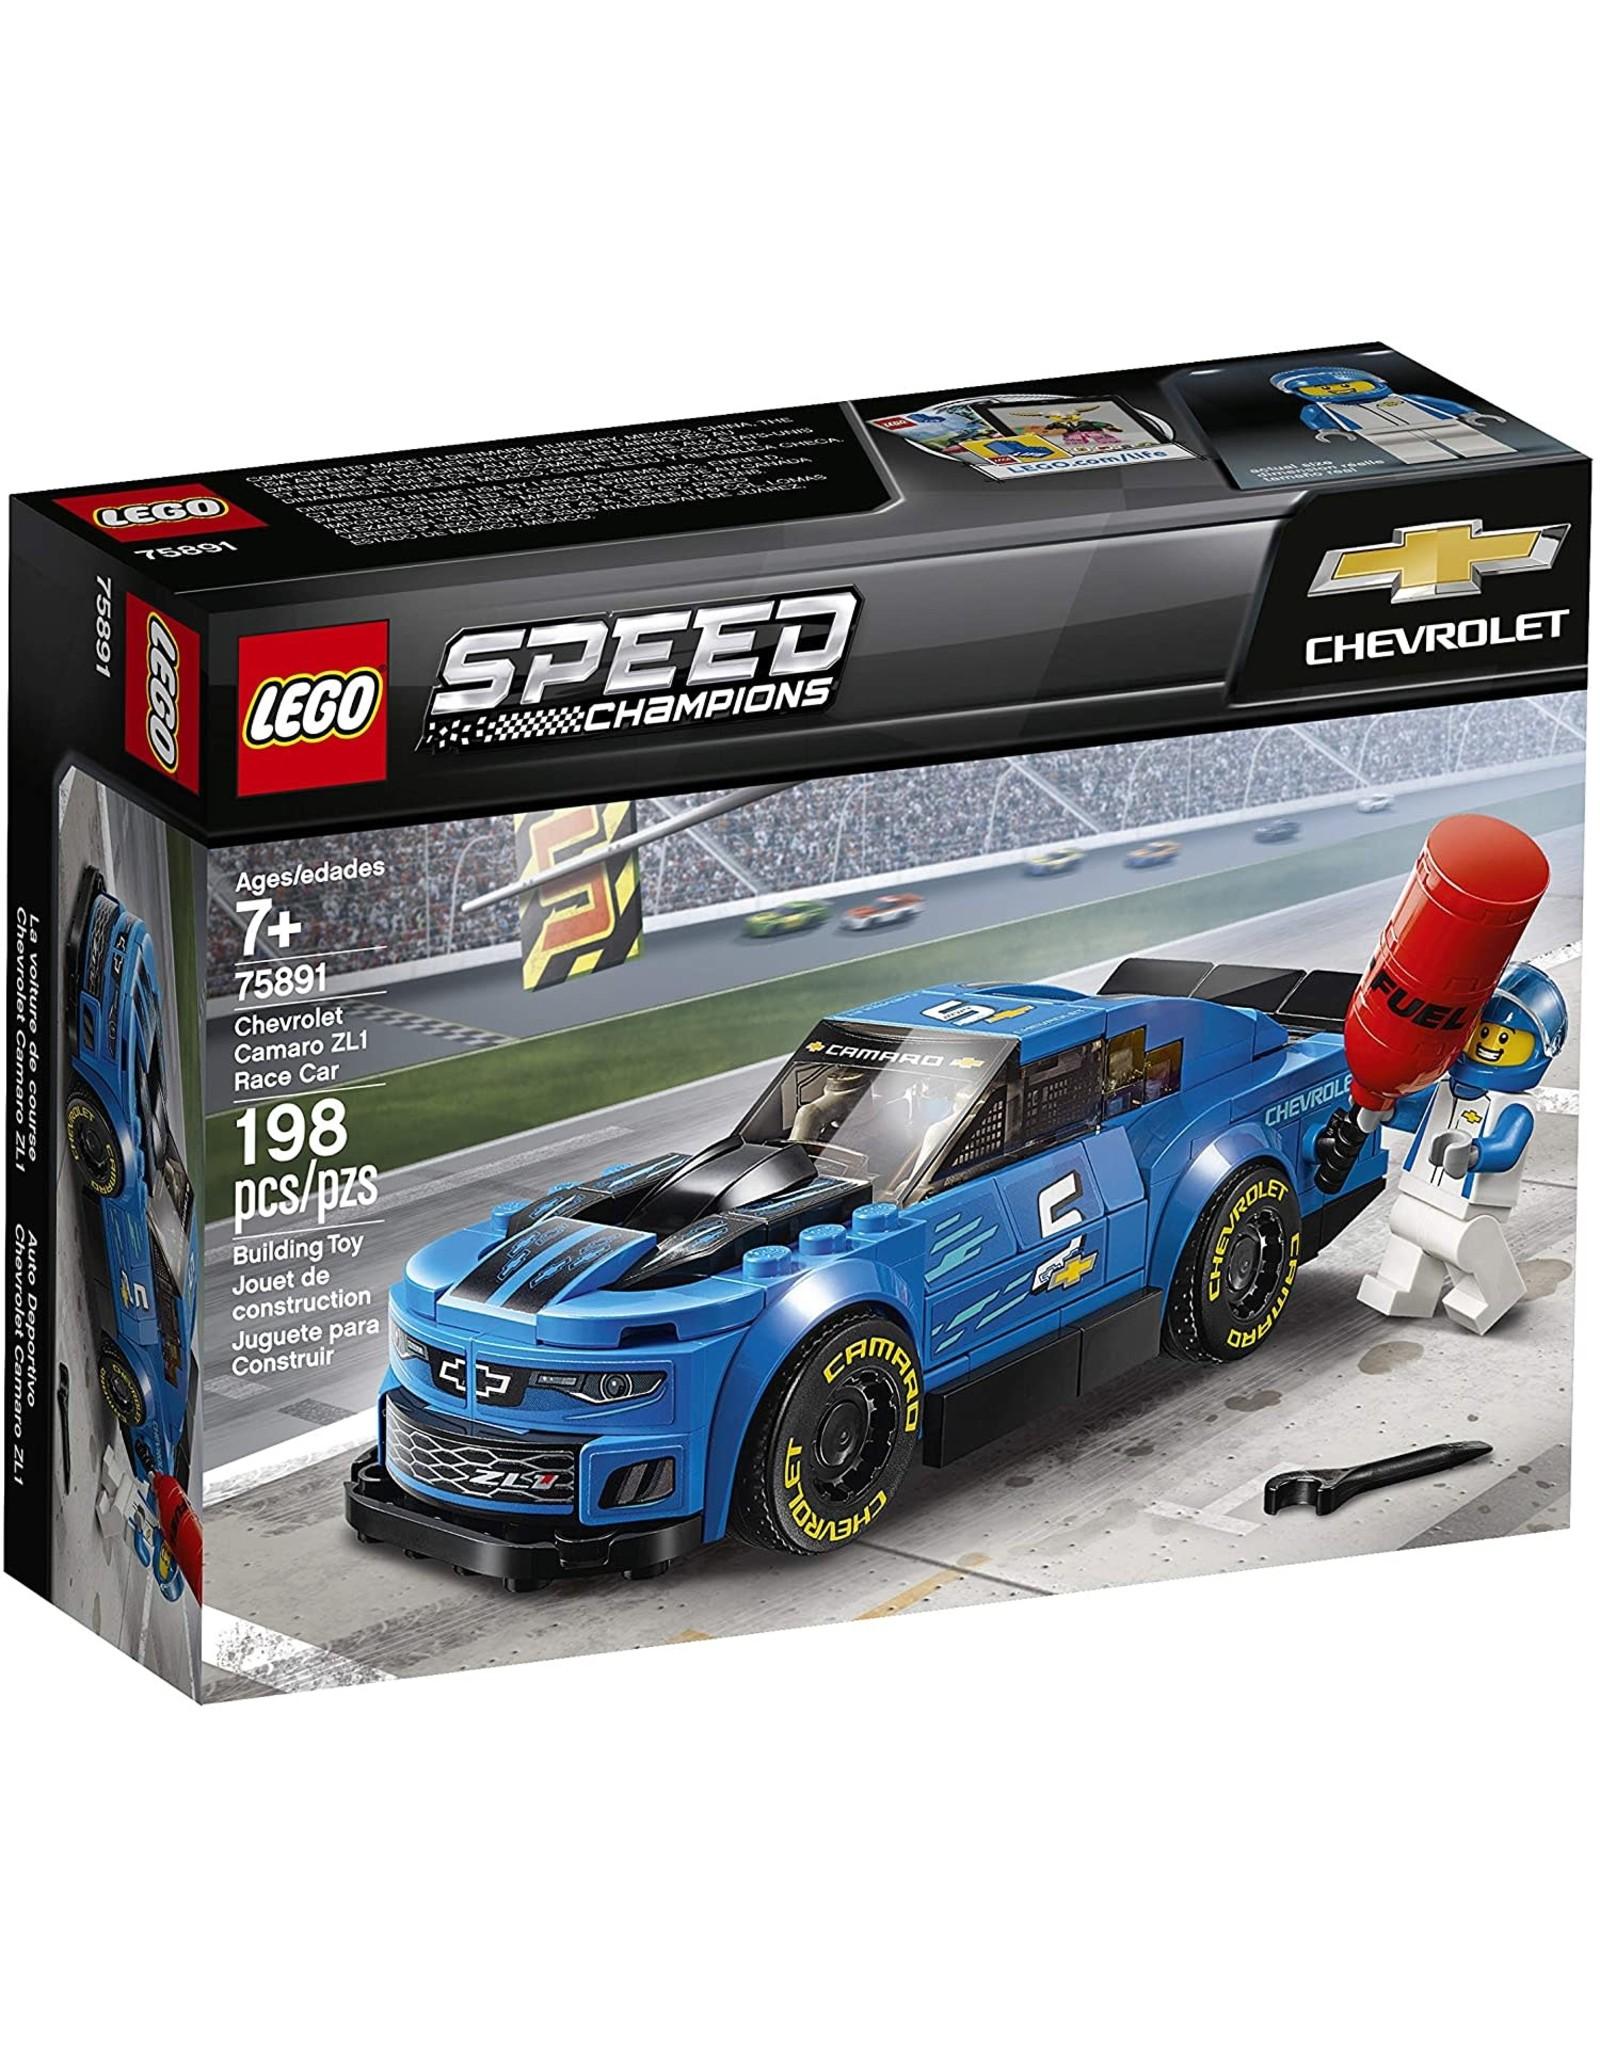 Lego Chevrolet Camaro ZL1 Race Car